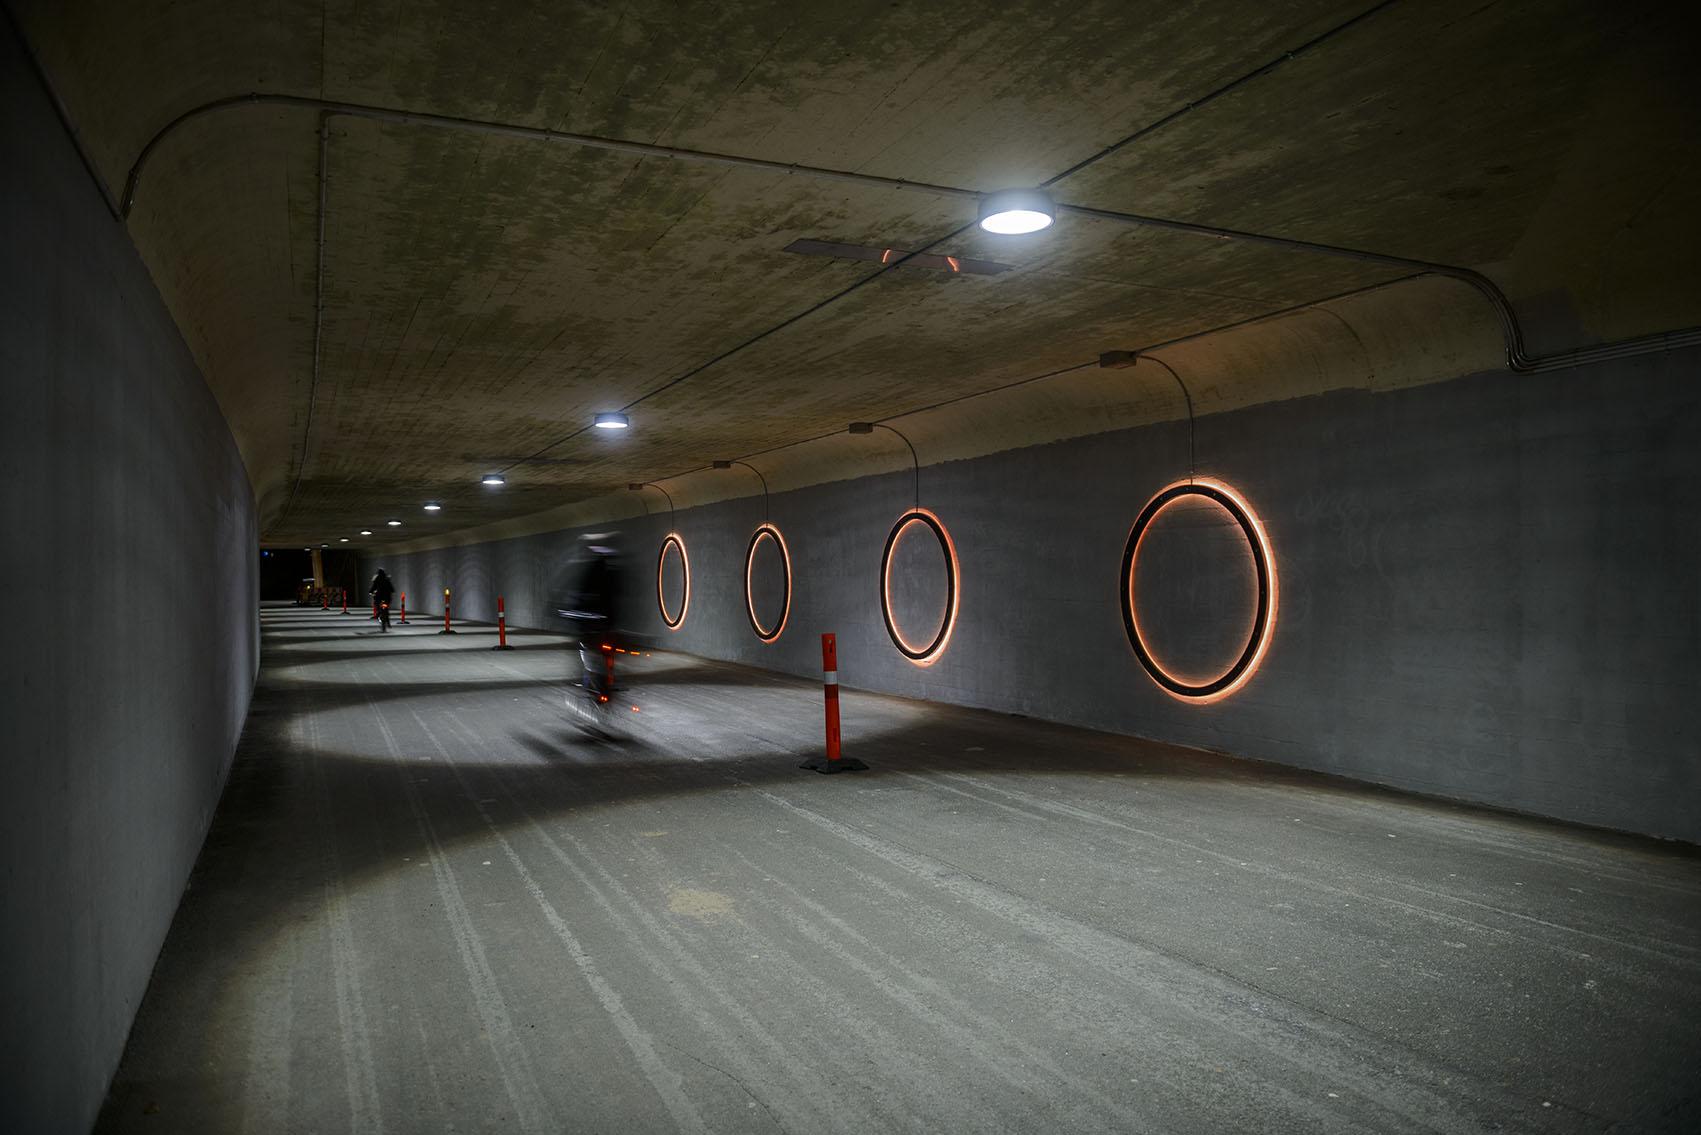 Adaptive lighting for Danish cyclists (c) Cycle Superhighways (2)